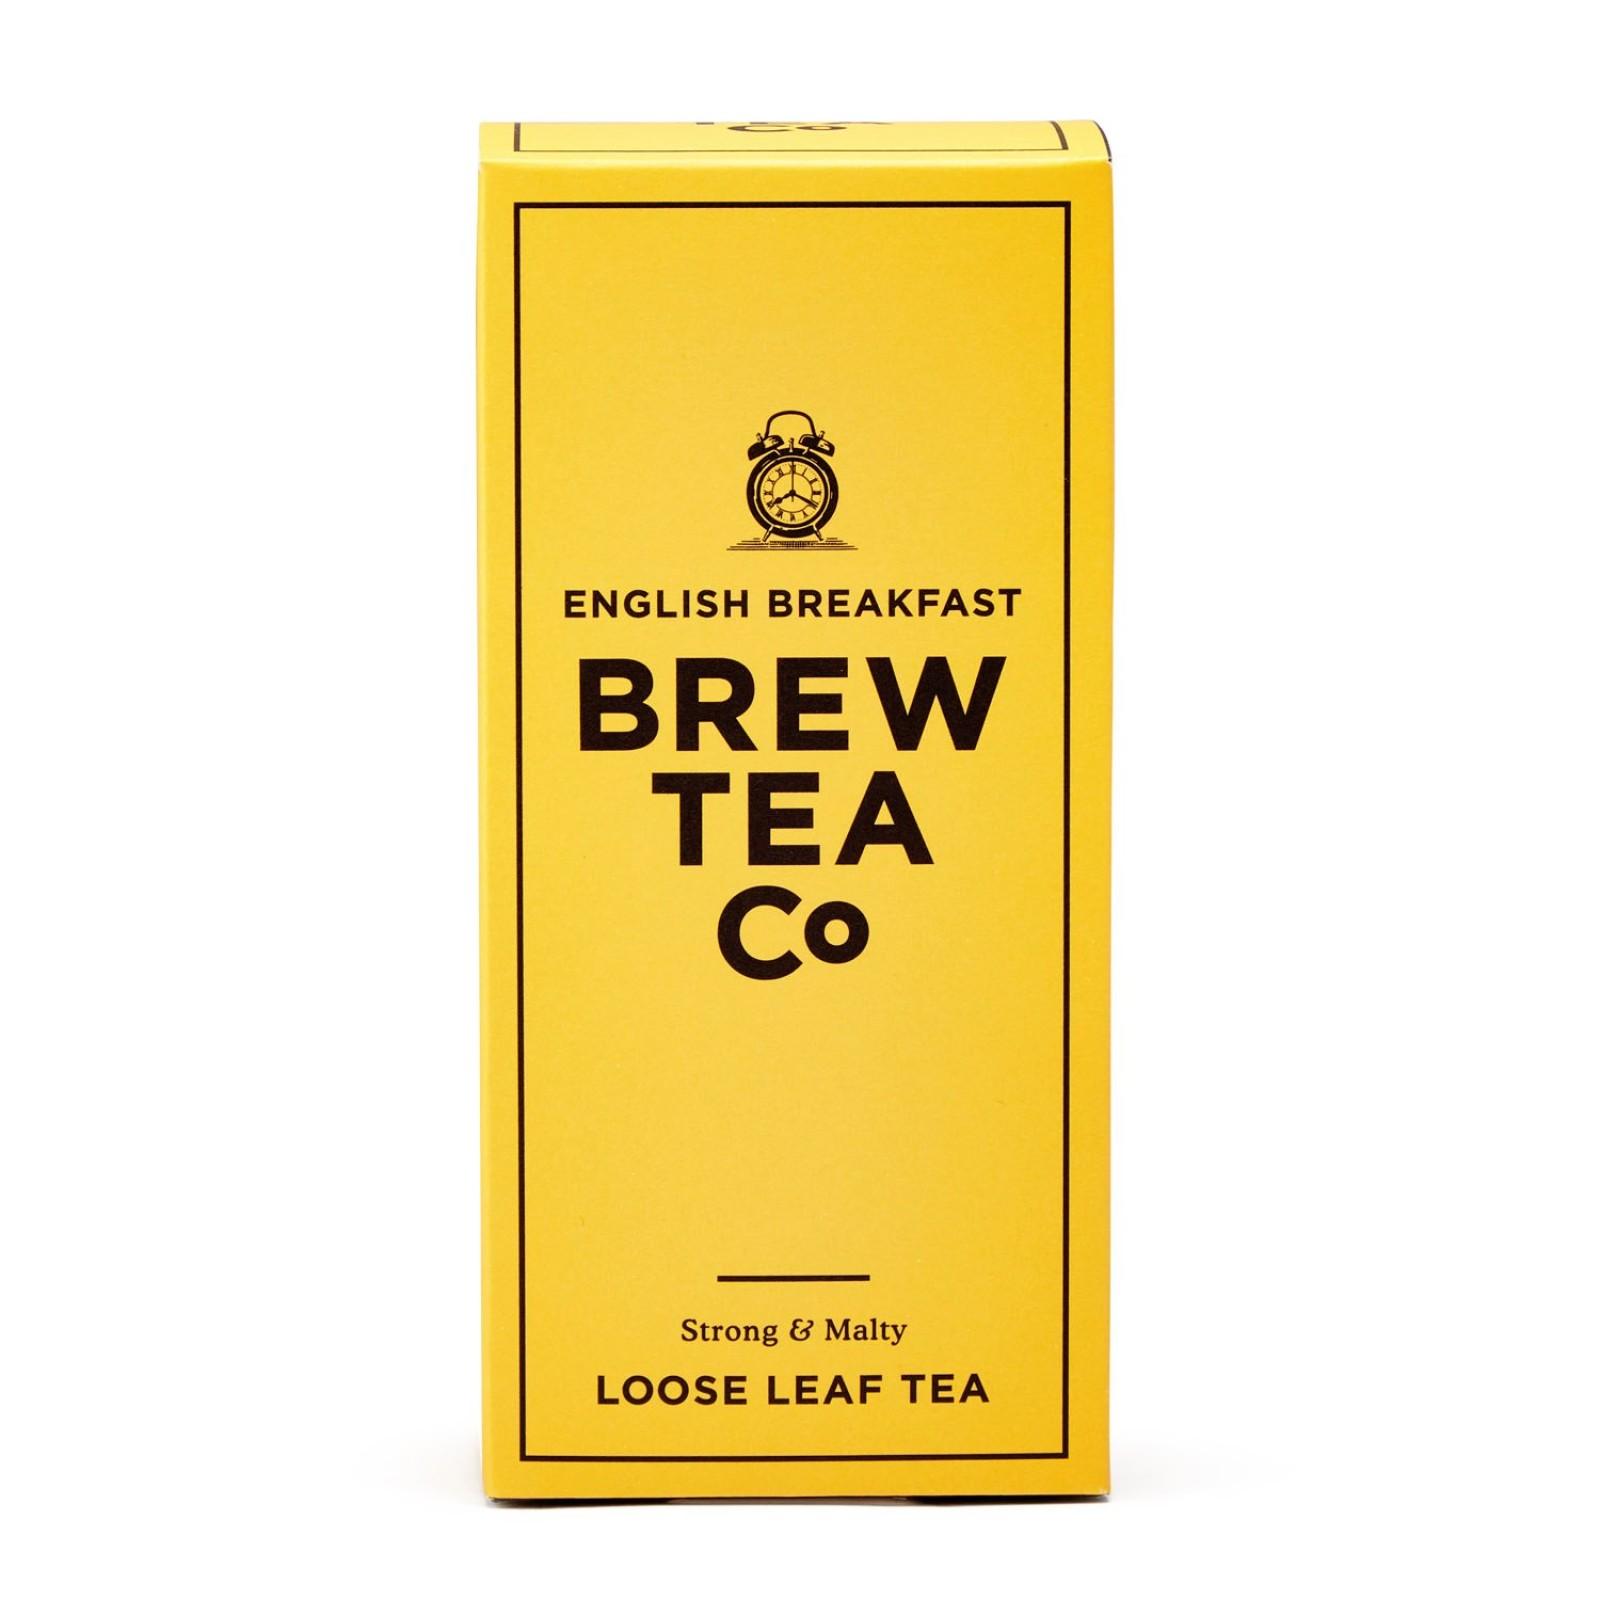 English Breakfast - Loose Leaf Tea 113g Brew Tea Co